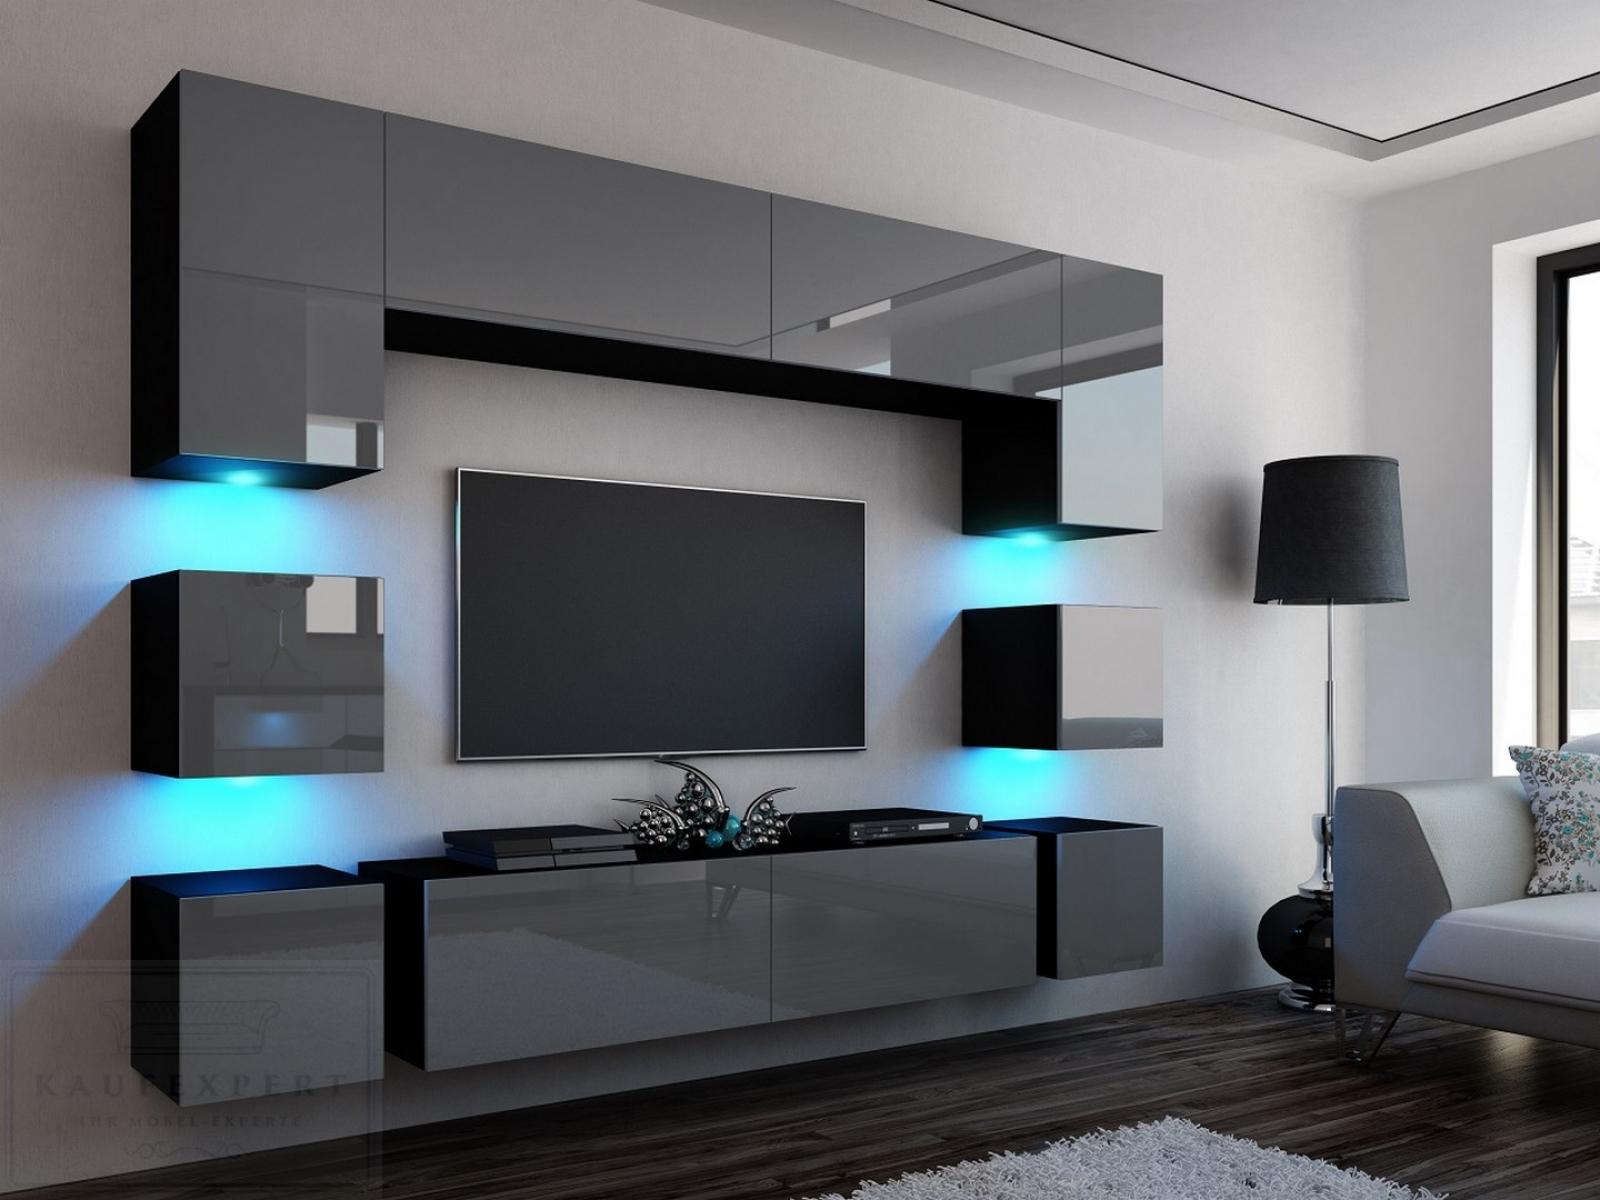 Kaufexpert Wohnwand Quadro Grau Hochglanz Schwarz 228 Cm Mediawand Medienwand Design Modern